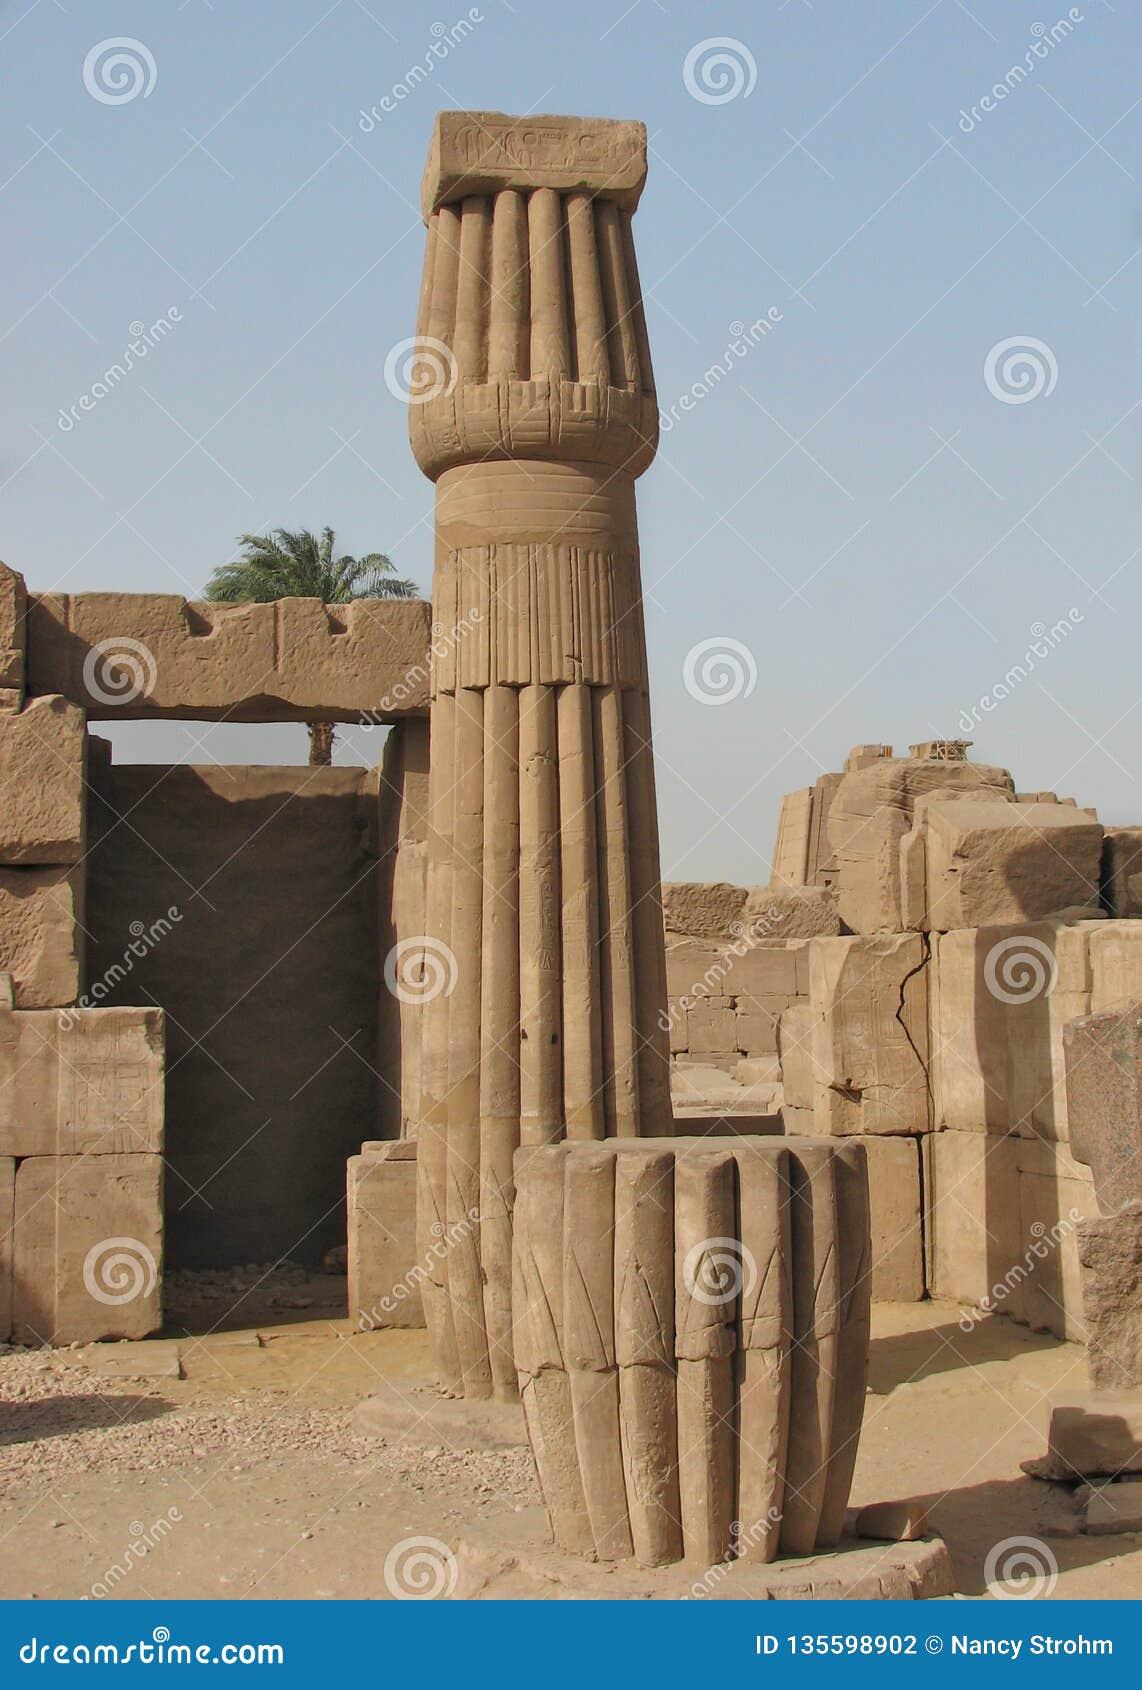 Papyrus Column, Temples of Karnak, Egypt